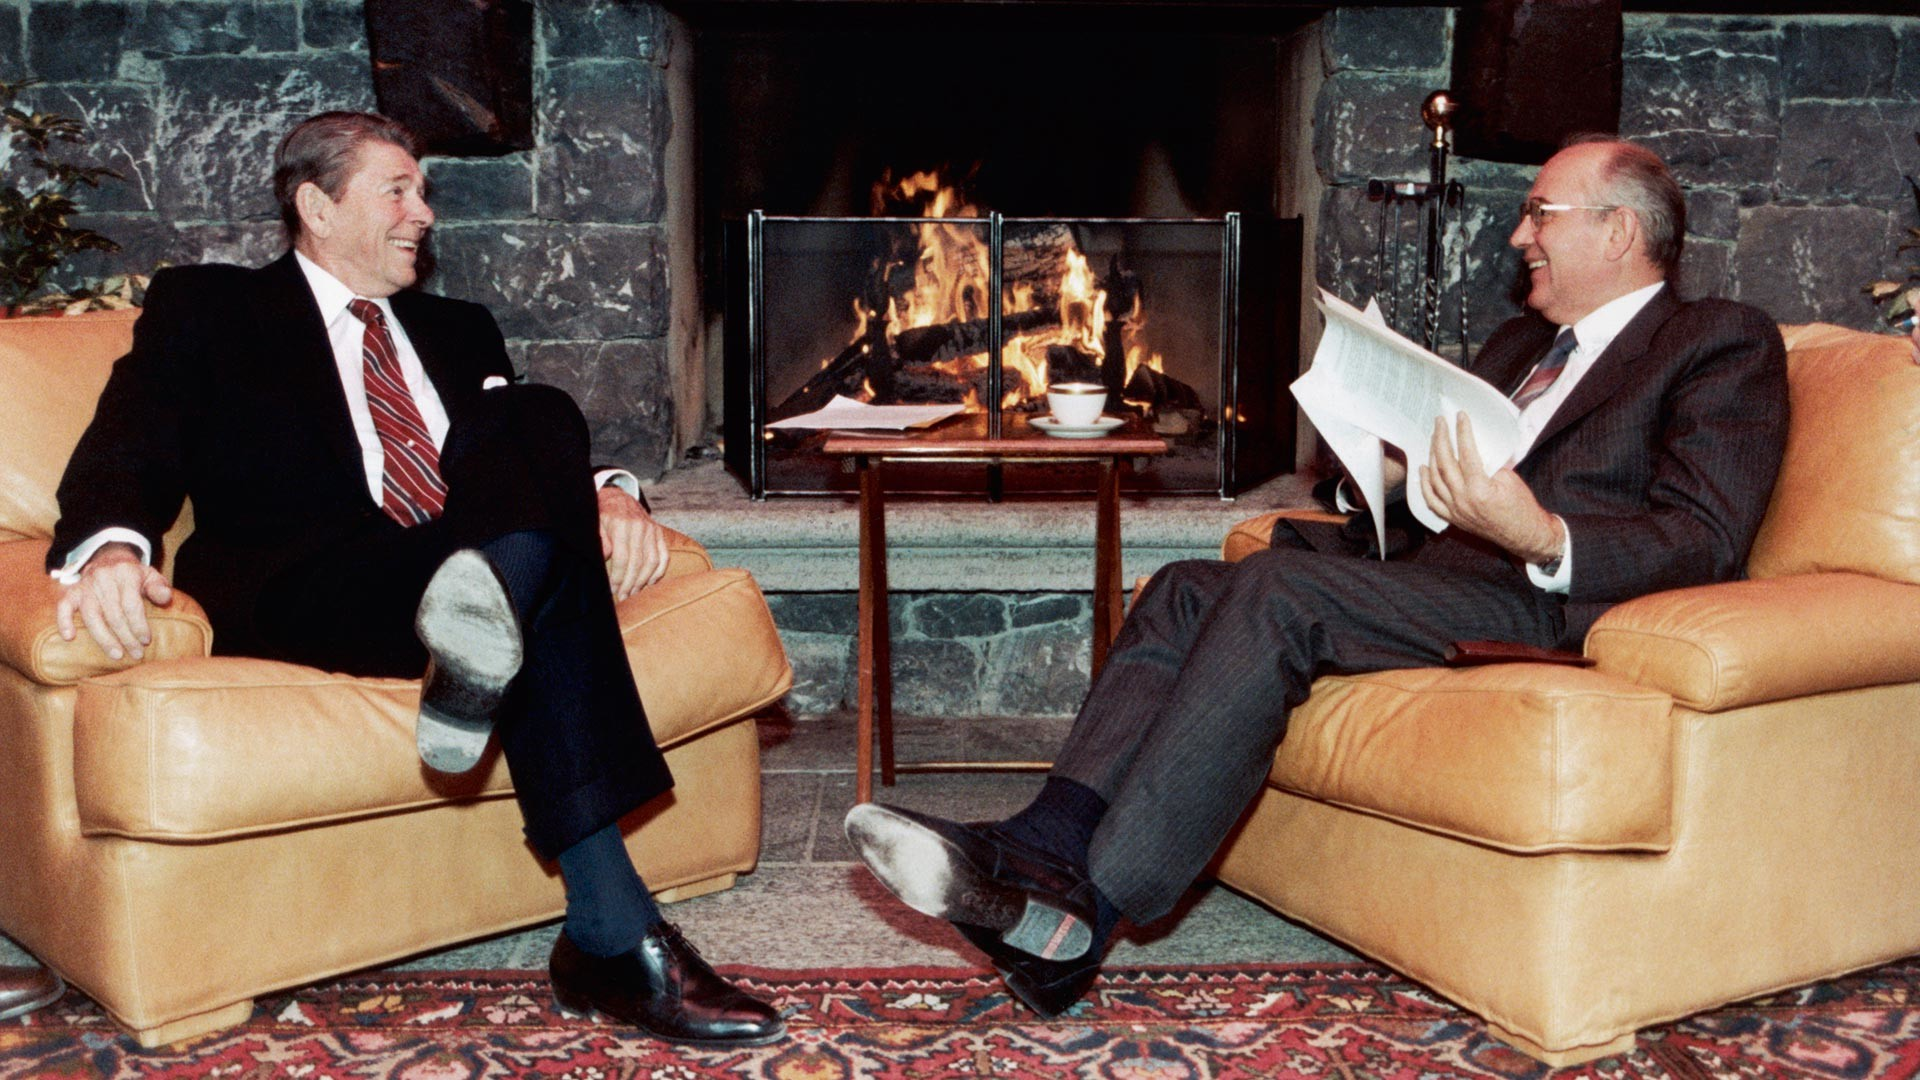 Ronald Reagan and Mikhail Gorbatchev share jokes on a break during the Geneva summit.